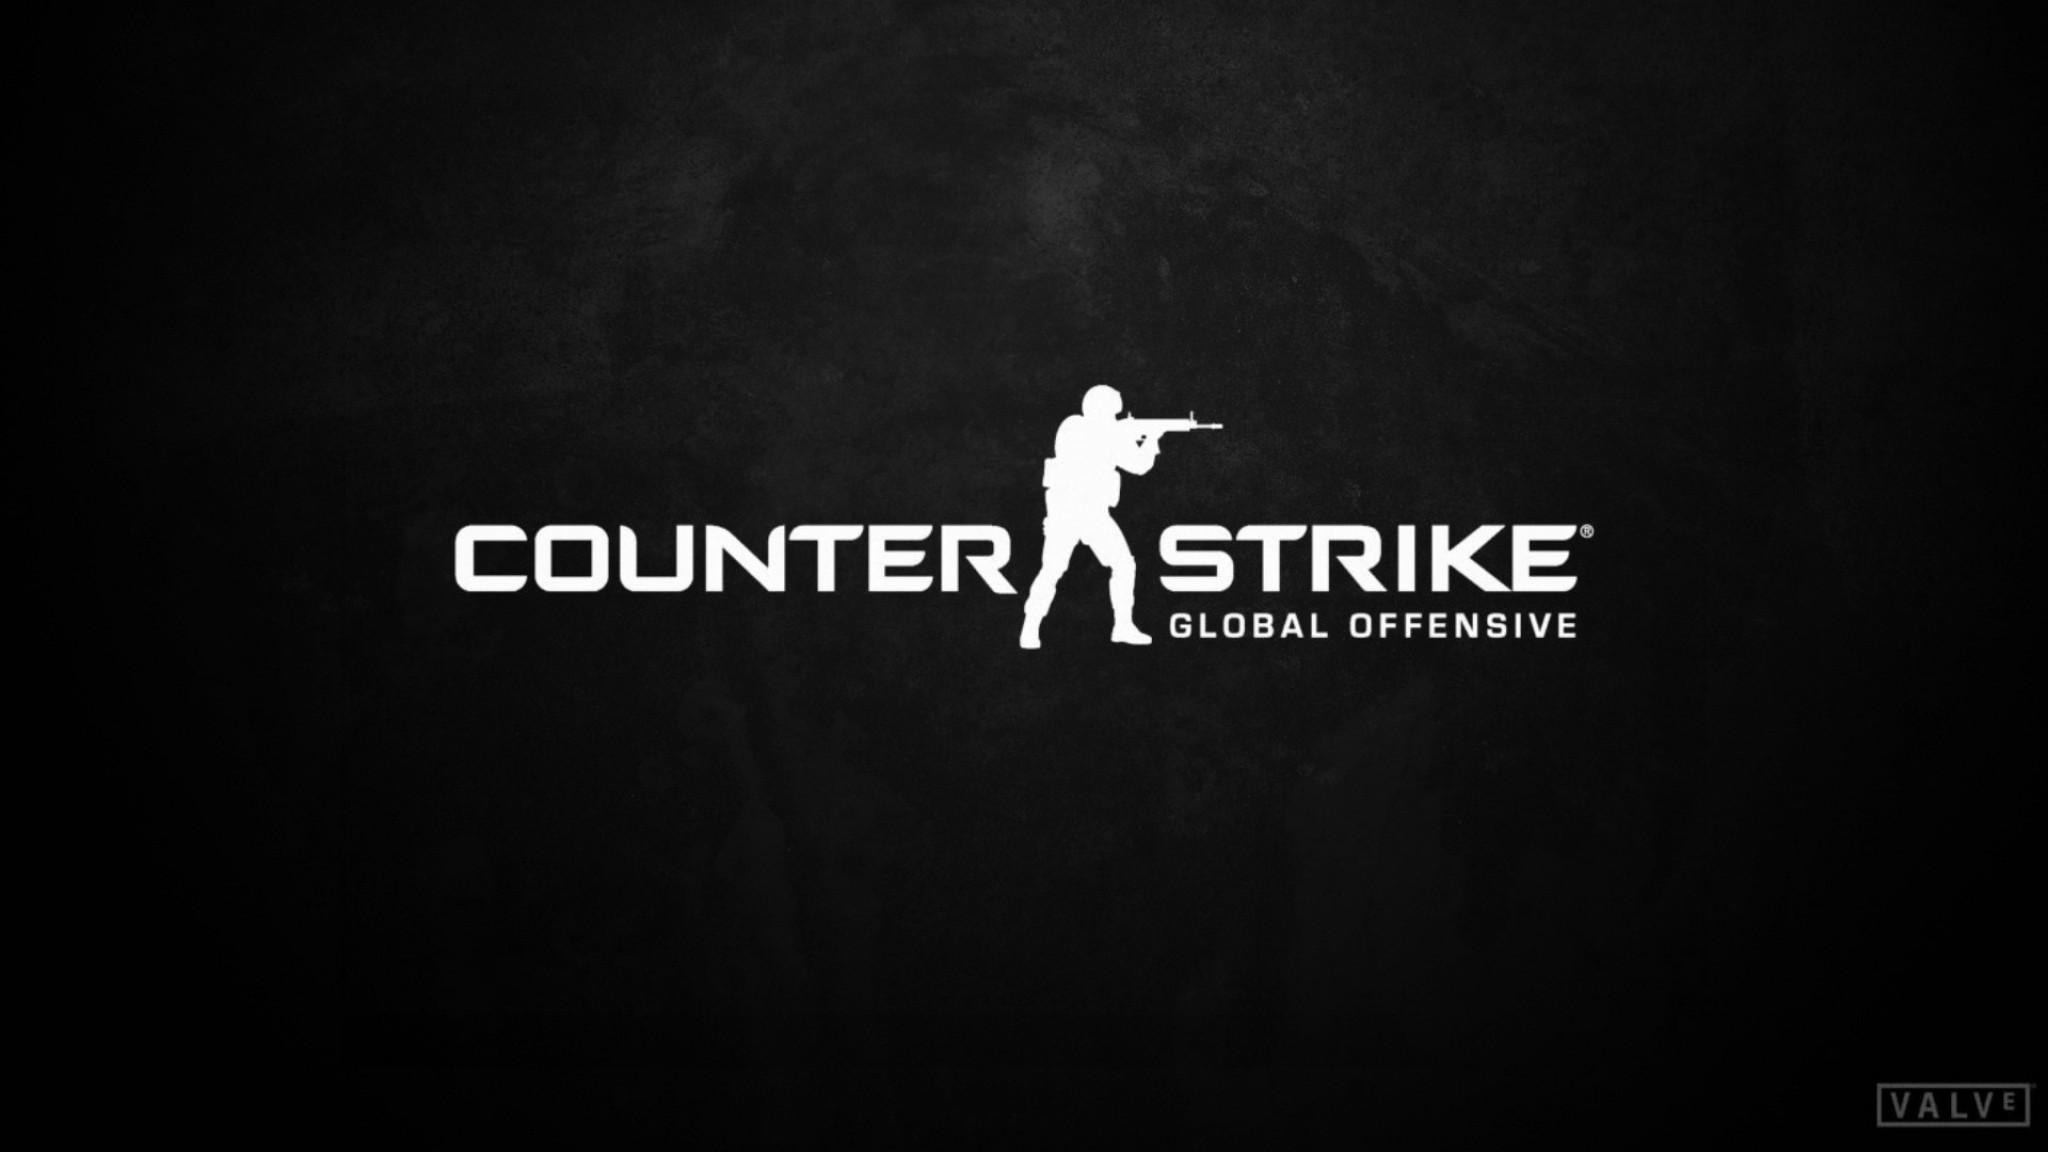 Wallpaper counter-strike global offensive, soldier, graphics,  background, gun